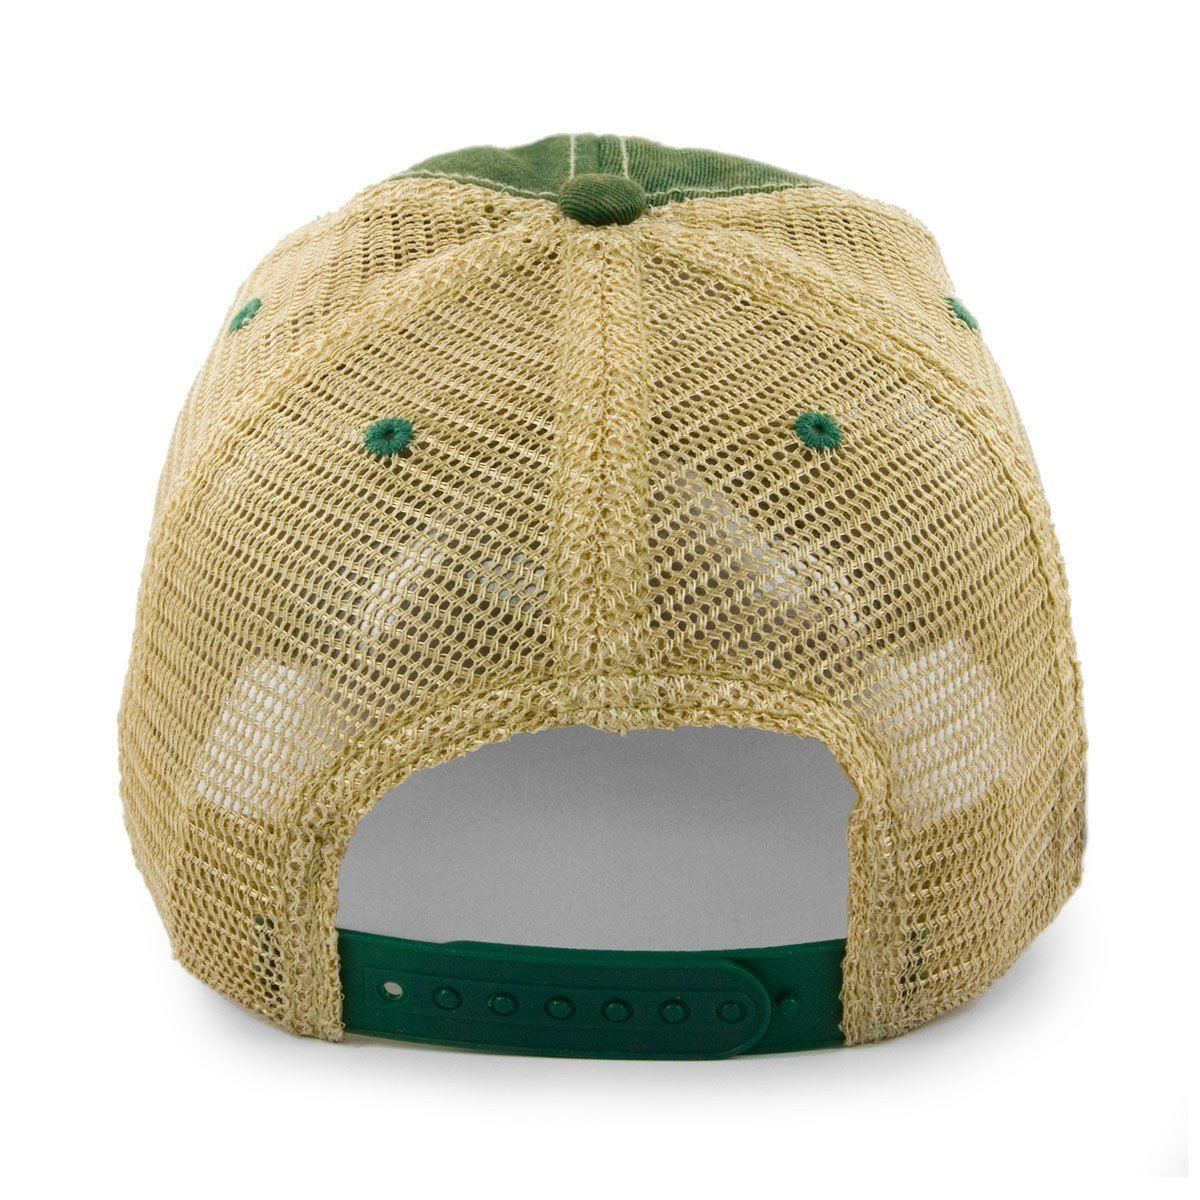 9c40e1ce3 Chowdaheadz Boston Shamrock Patch Dirty Water Mesh Trucker Hat - Green at  Amazon Men's Clothing store: